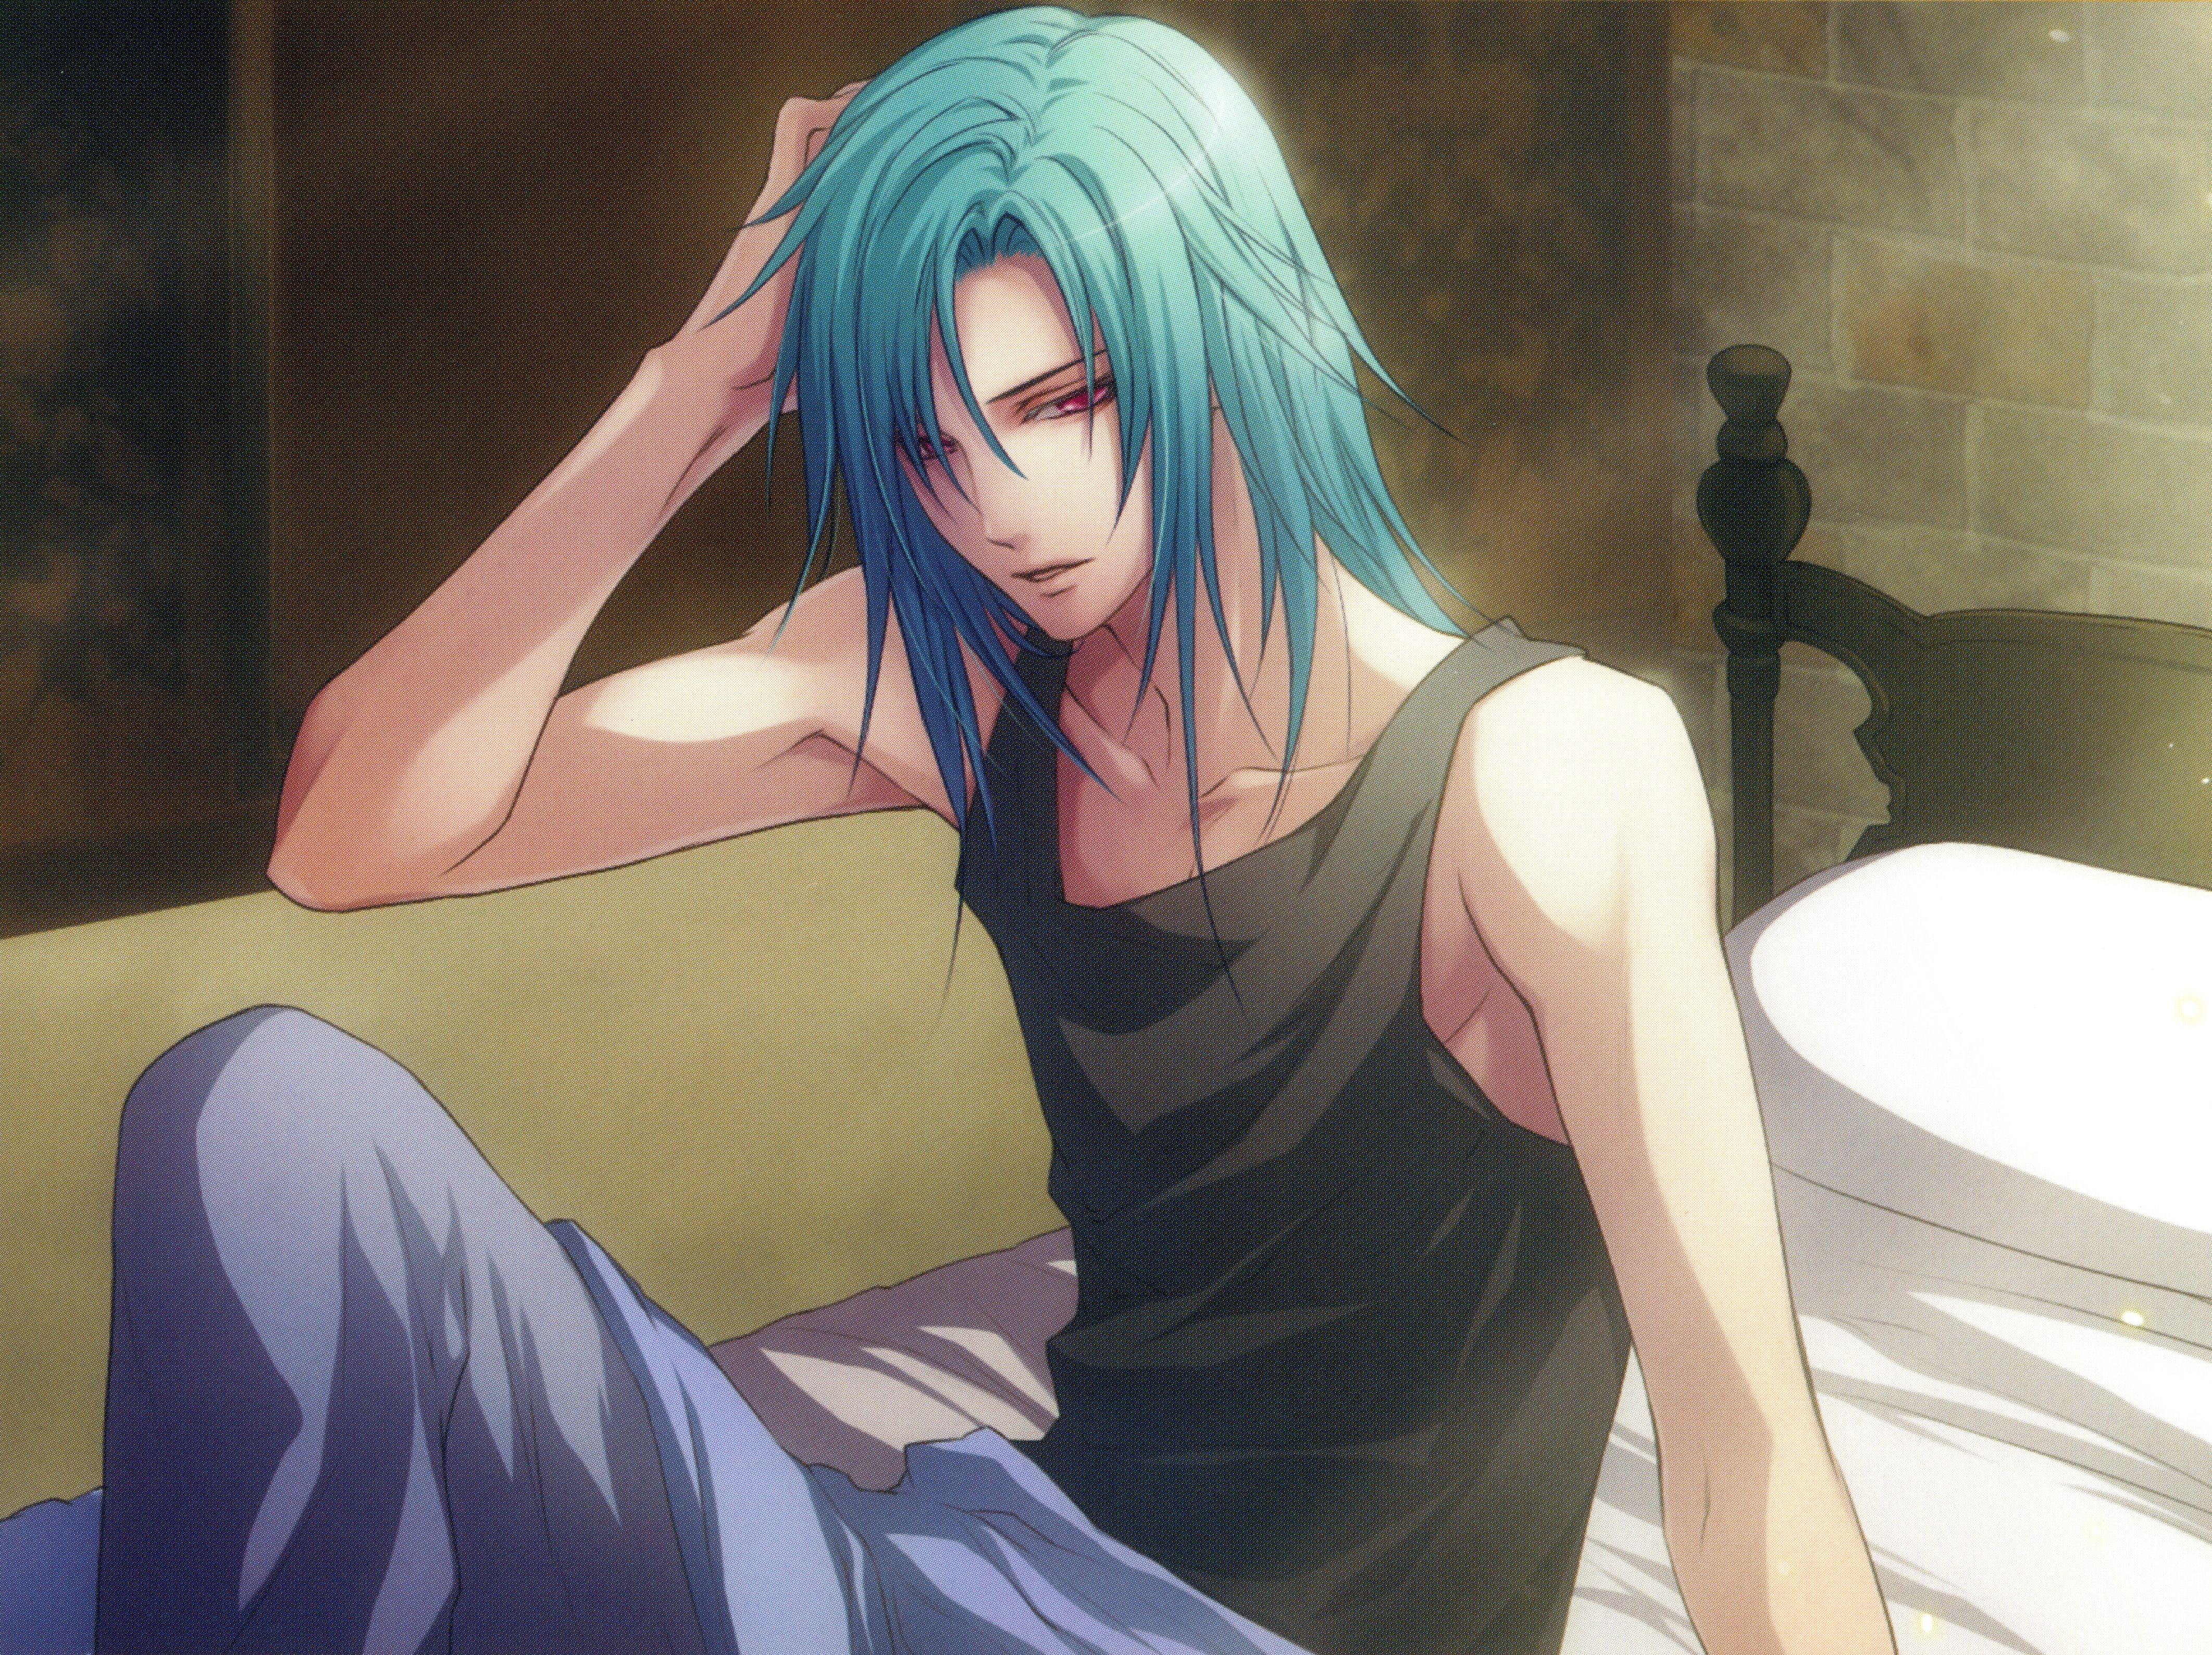 Pin By Half Bad On Fan Art Anime Guy Blue Hair Anime Guys Anime Guys Shirtless